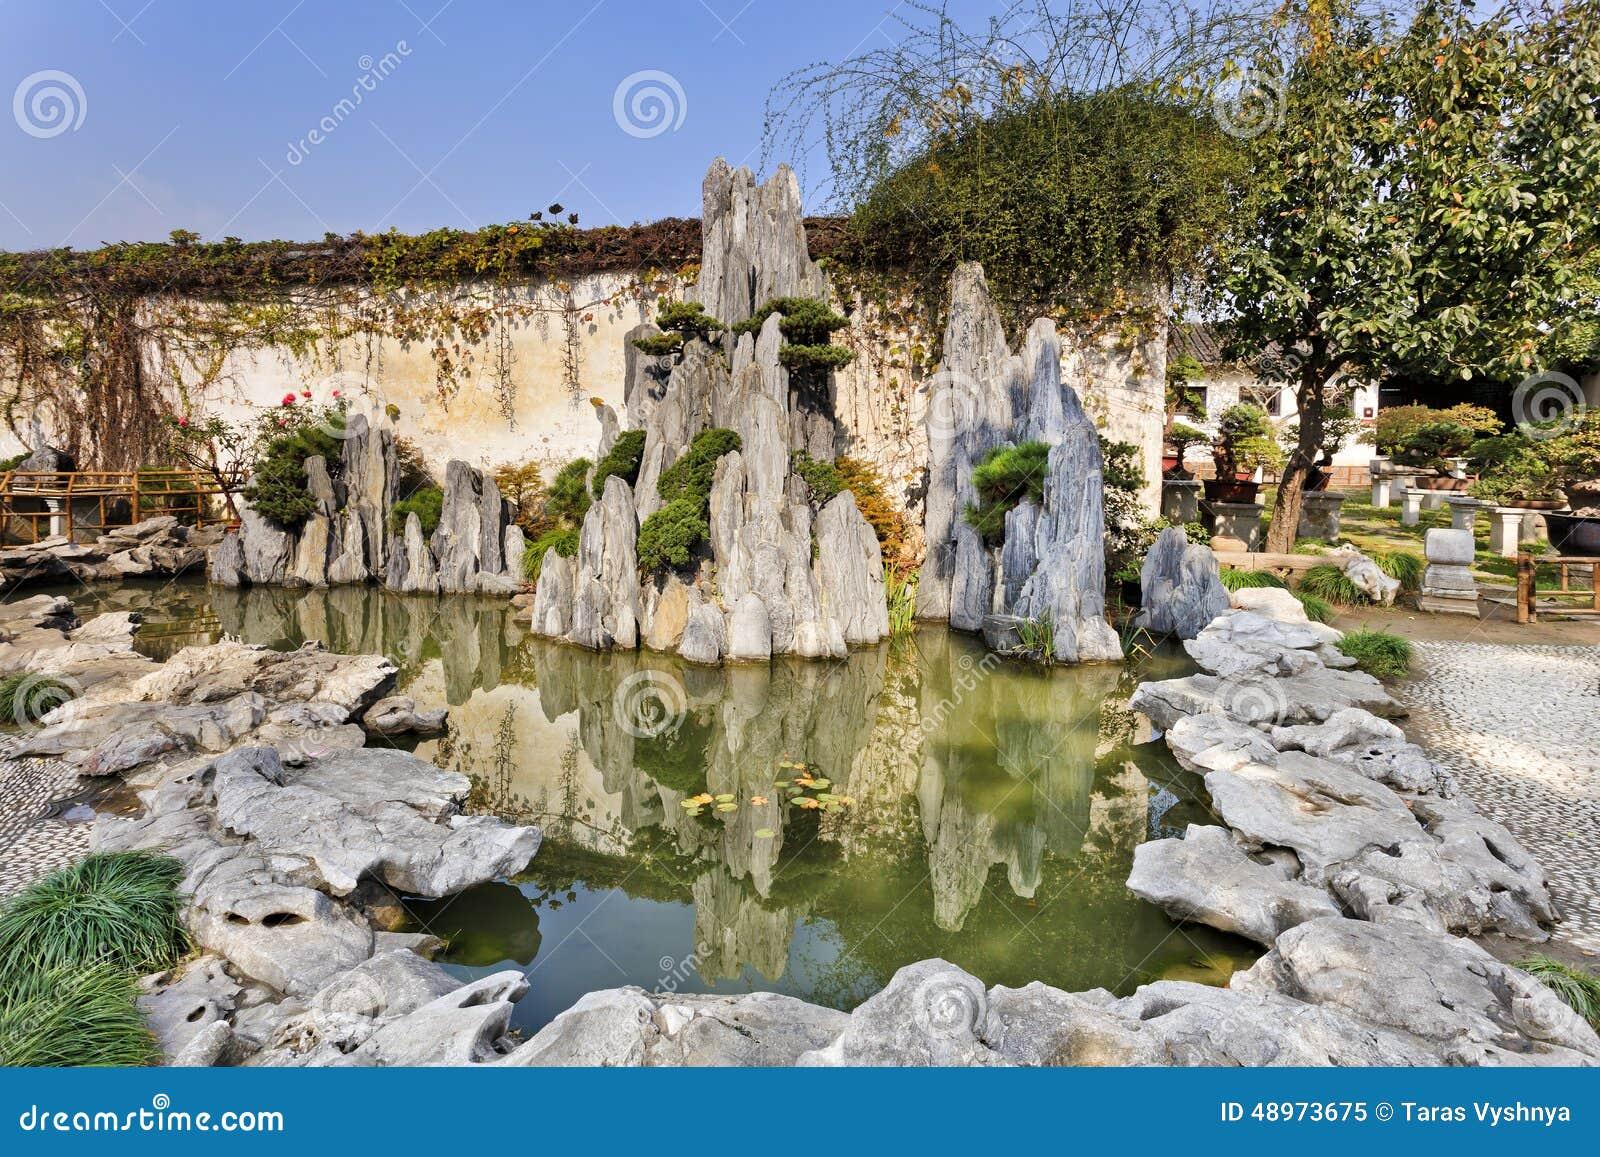 Le jardin de la chine nanjing bascule l 39 tang photo stock for Conception jardin chinois